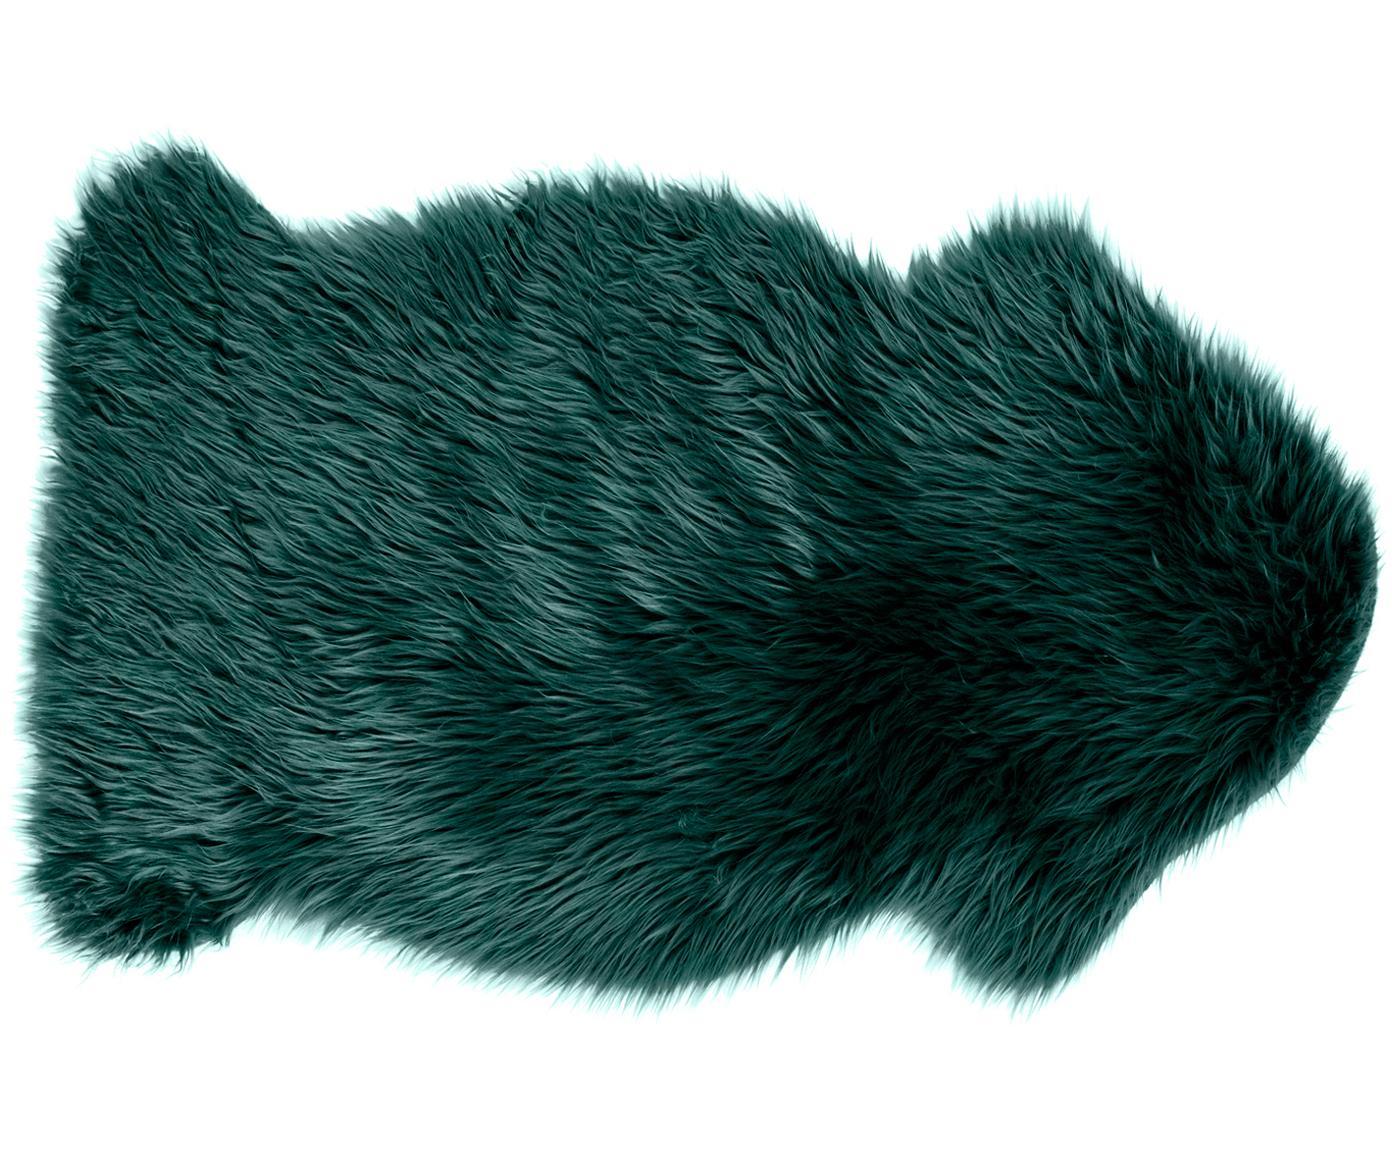 Kunstfell Vancouver, glatt, Vorderseite: 80% Acryl, 20% Polyester, Rückseite: Polyester, glatt, Dunkelgrün, 60 x 100 cm